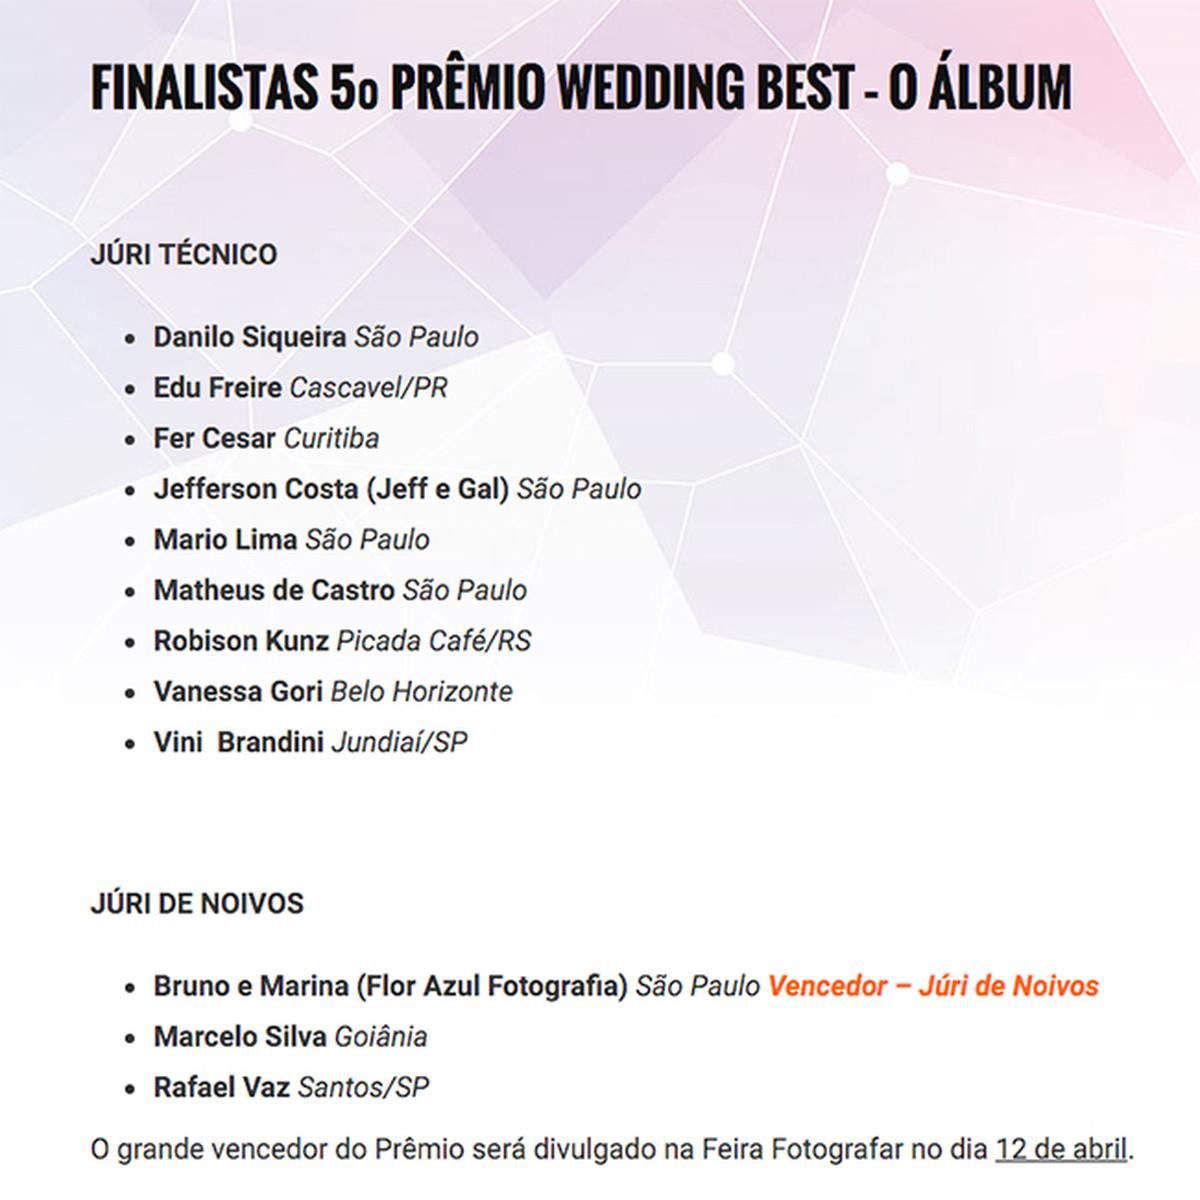 robison-kunz-finalista-wedding-best-melhor-album-de-casamento-do-brasil-robison-kunz-finalista-melhor-album-casamento-brasil